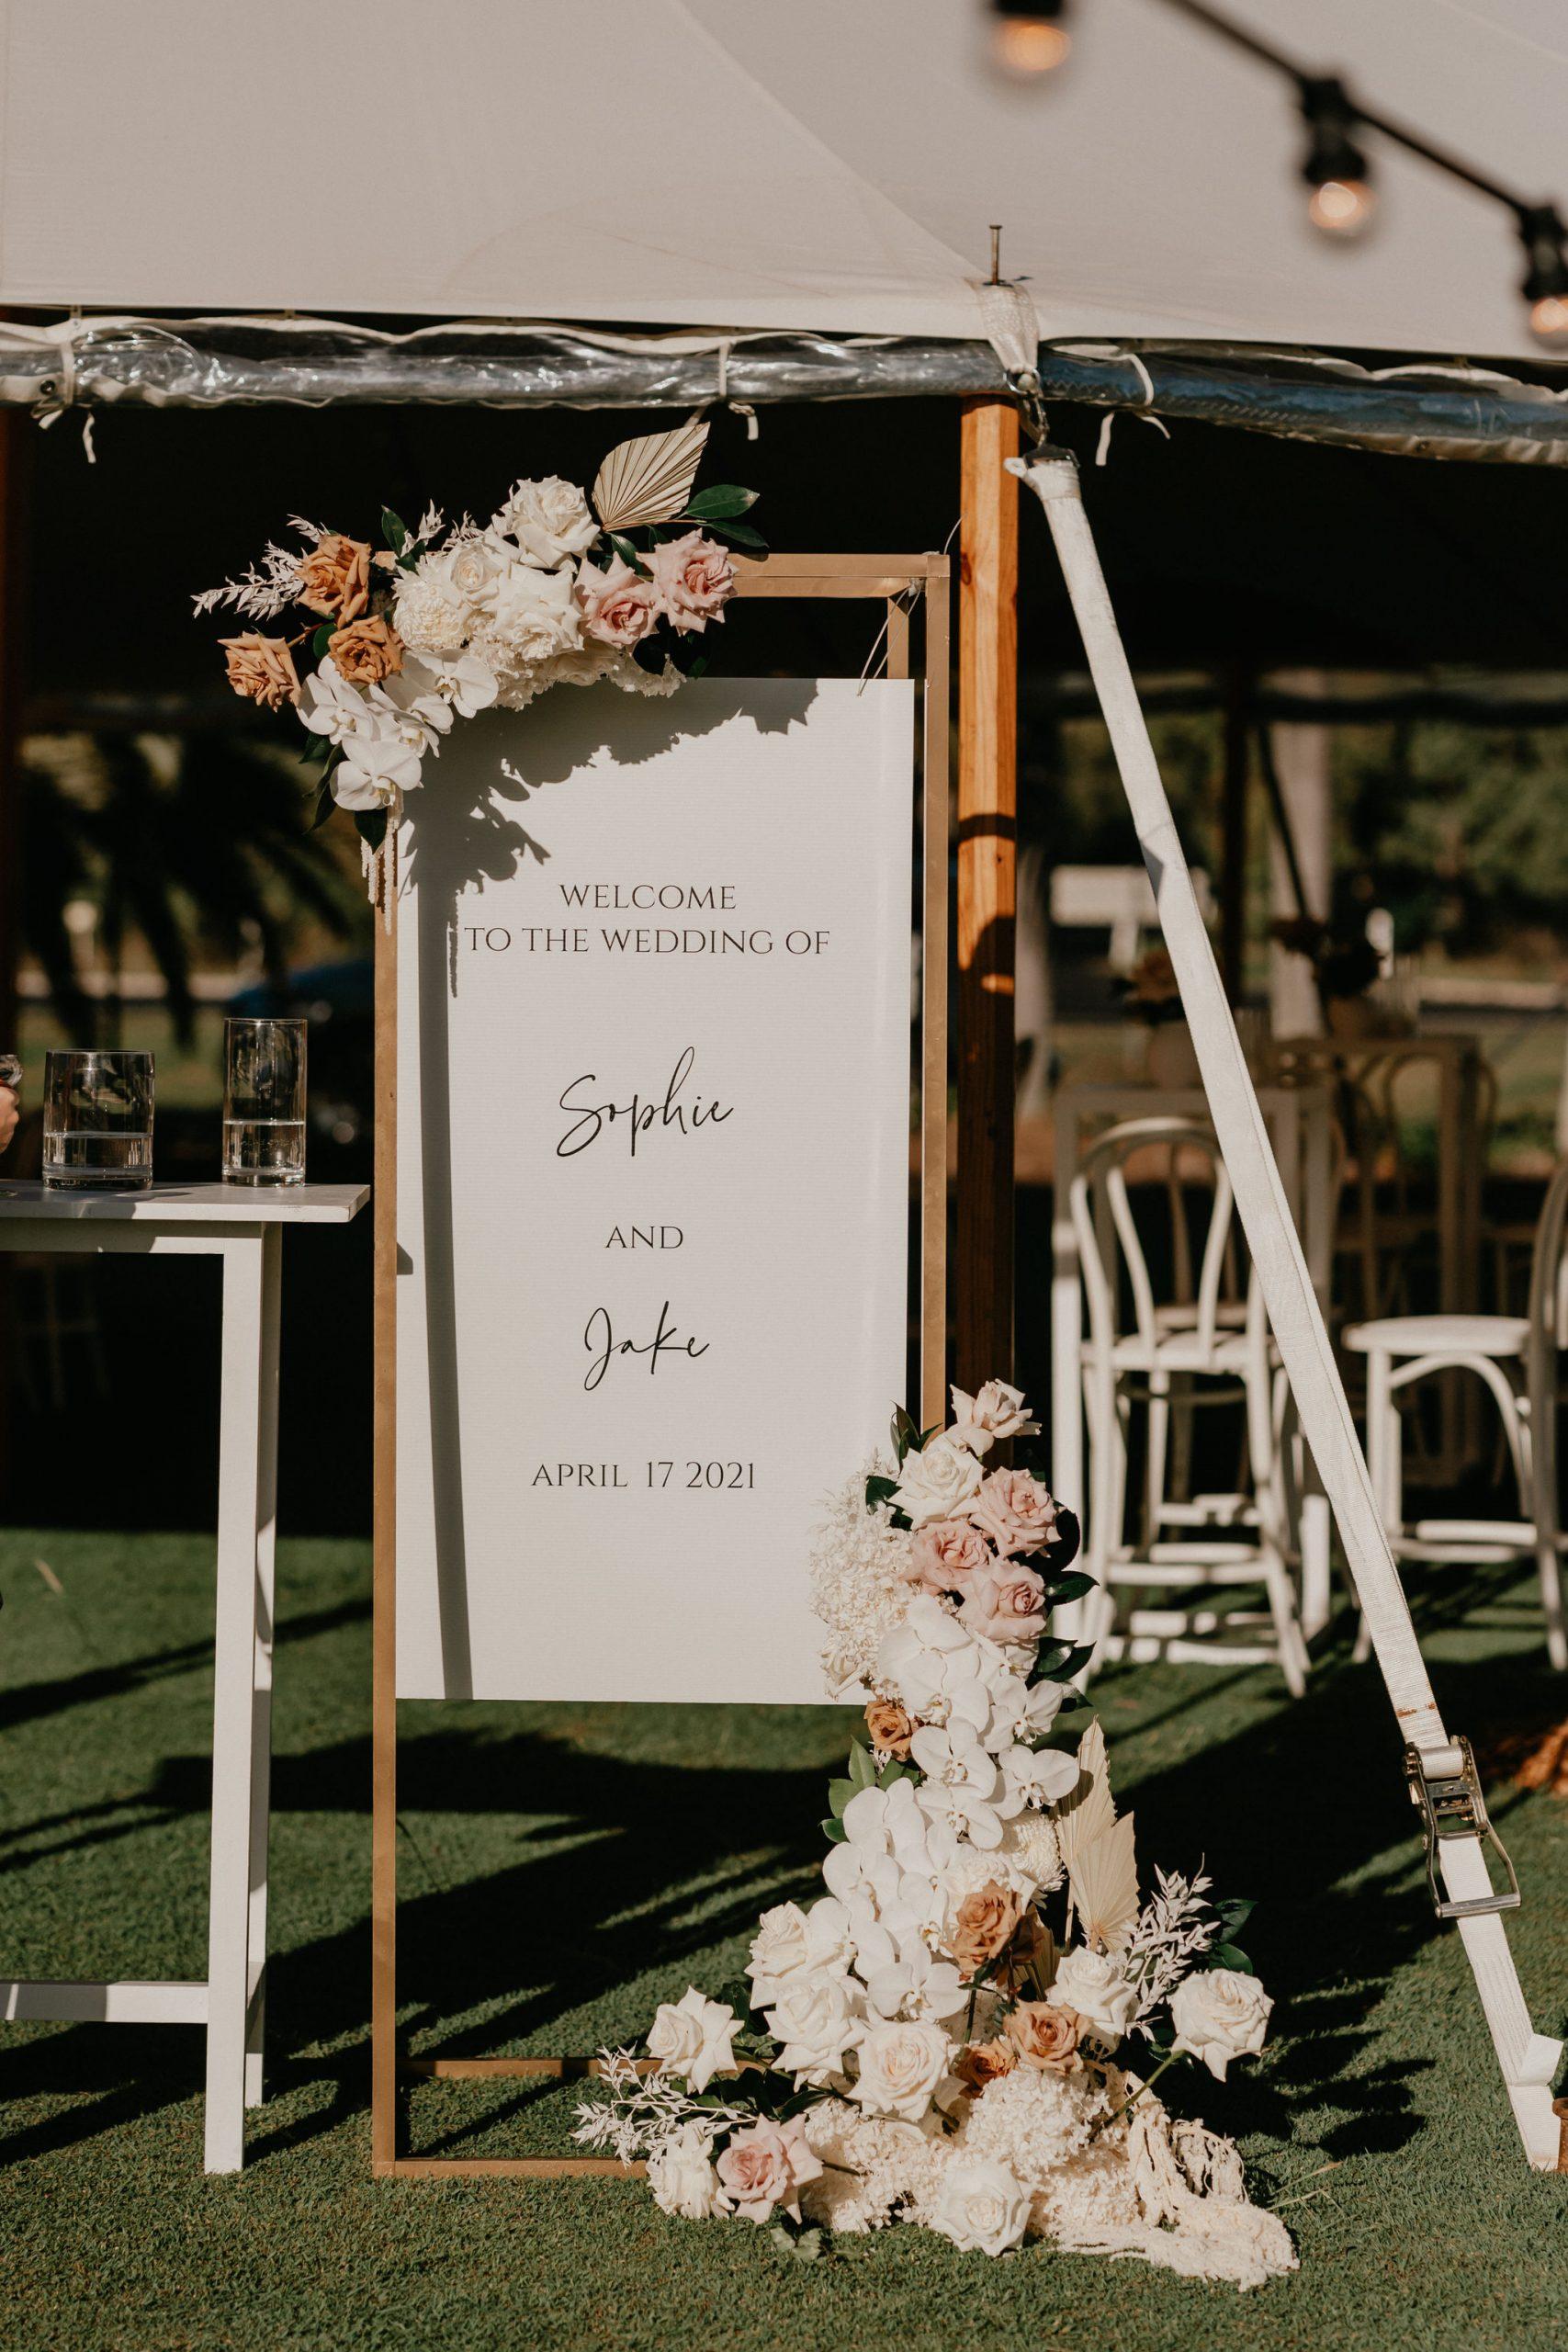 Sperry Tent Wedding Reception